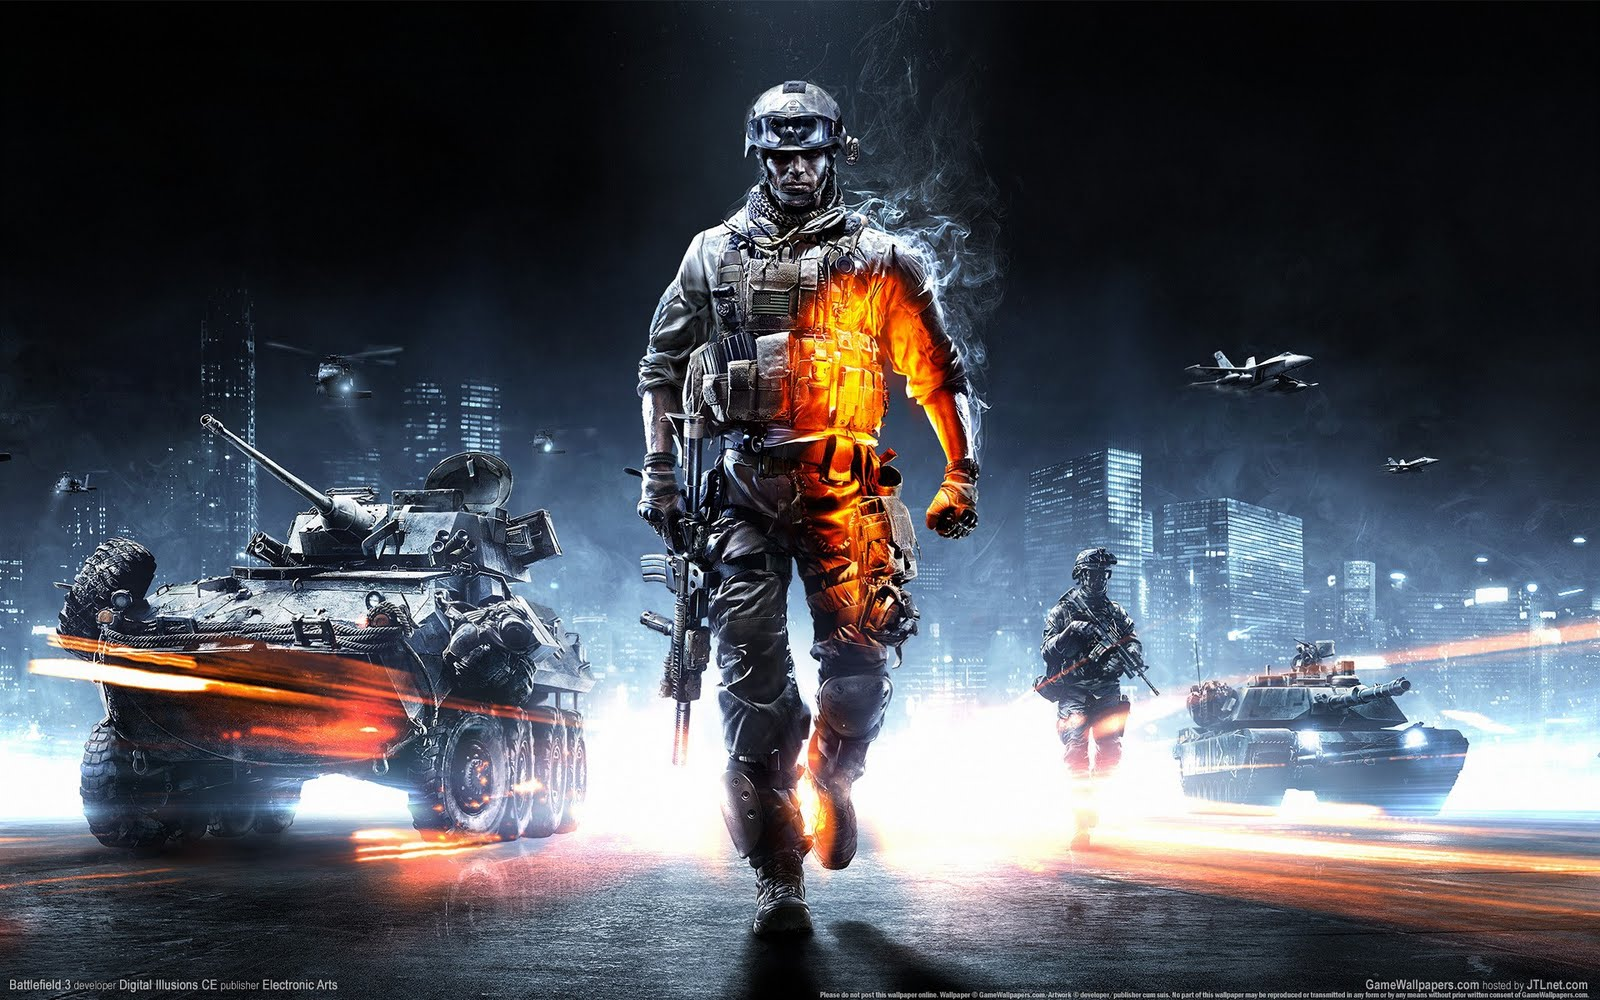 Battlefield 3 HD Wallpapers | Desktop Wallpapers